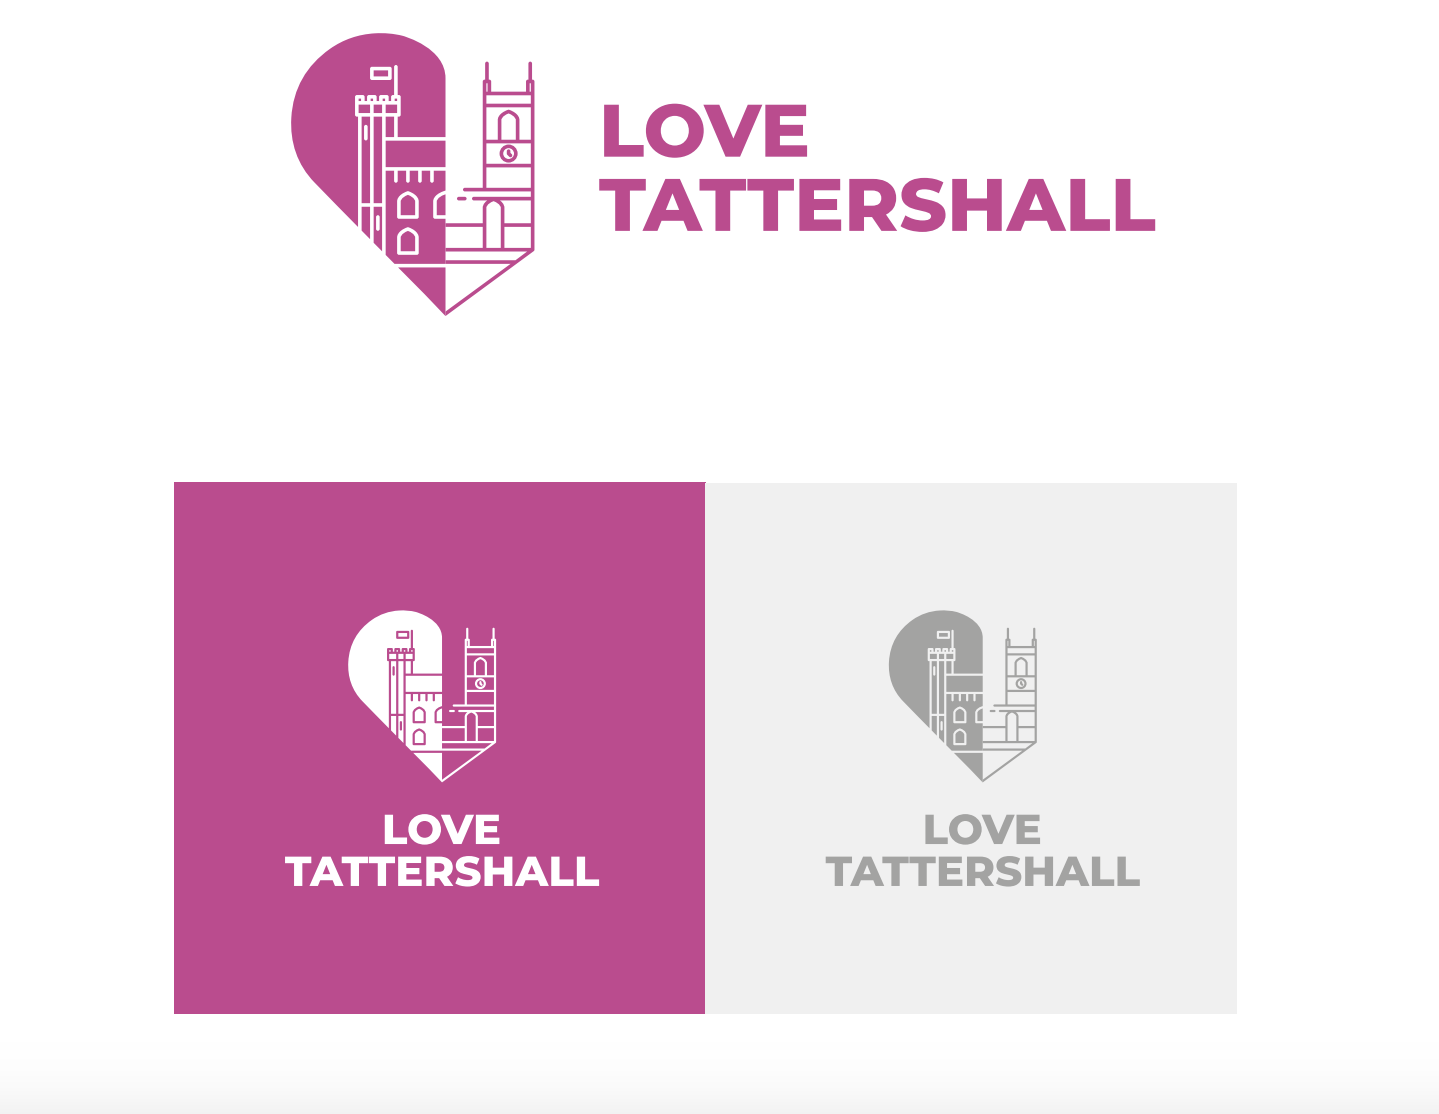 Love Tattershall